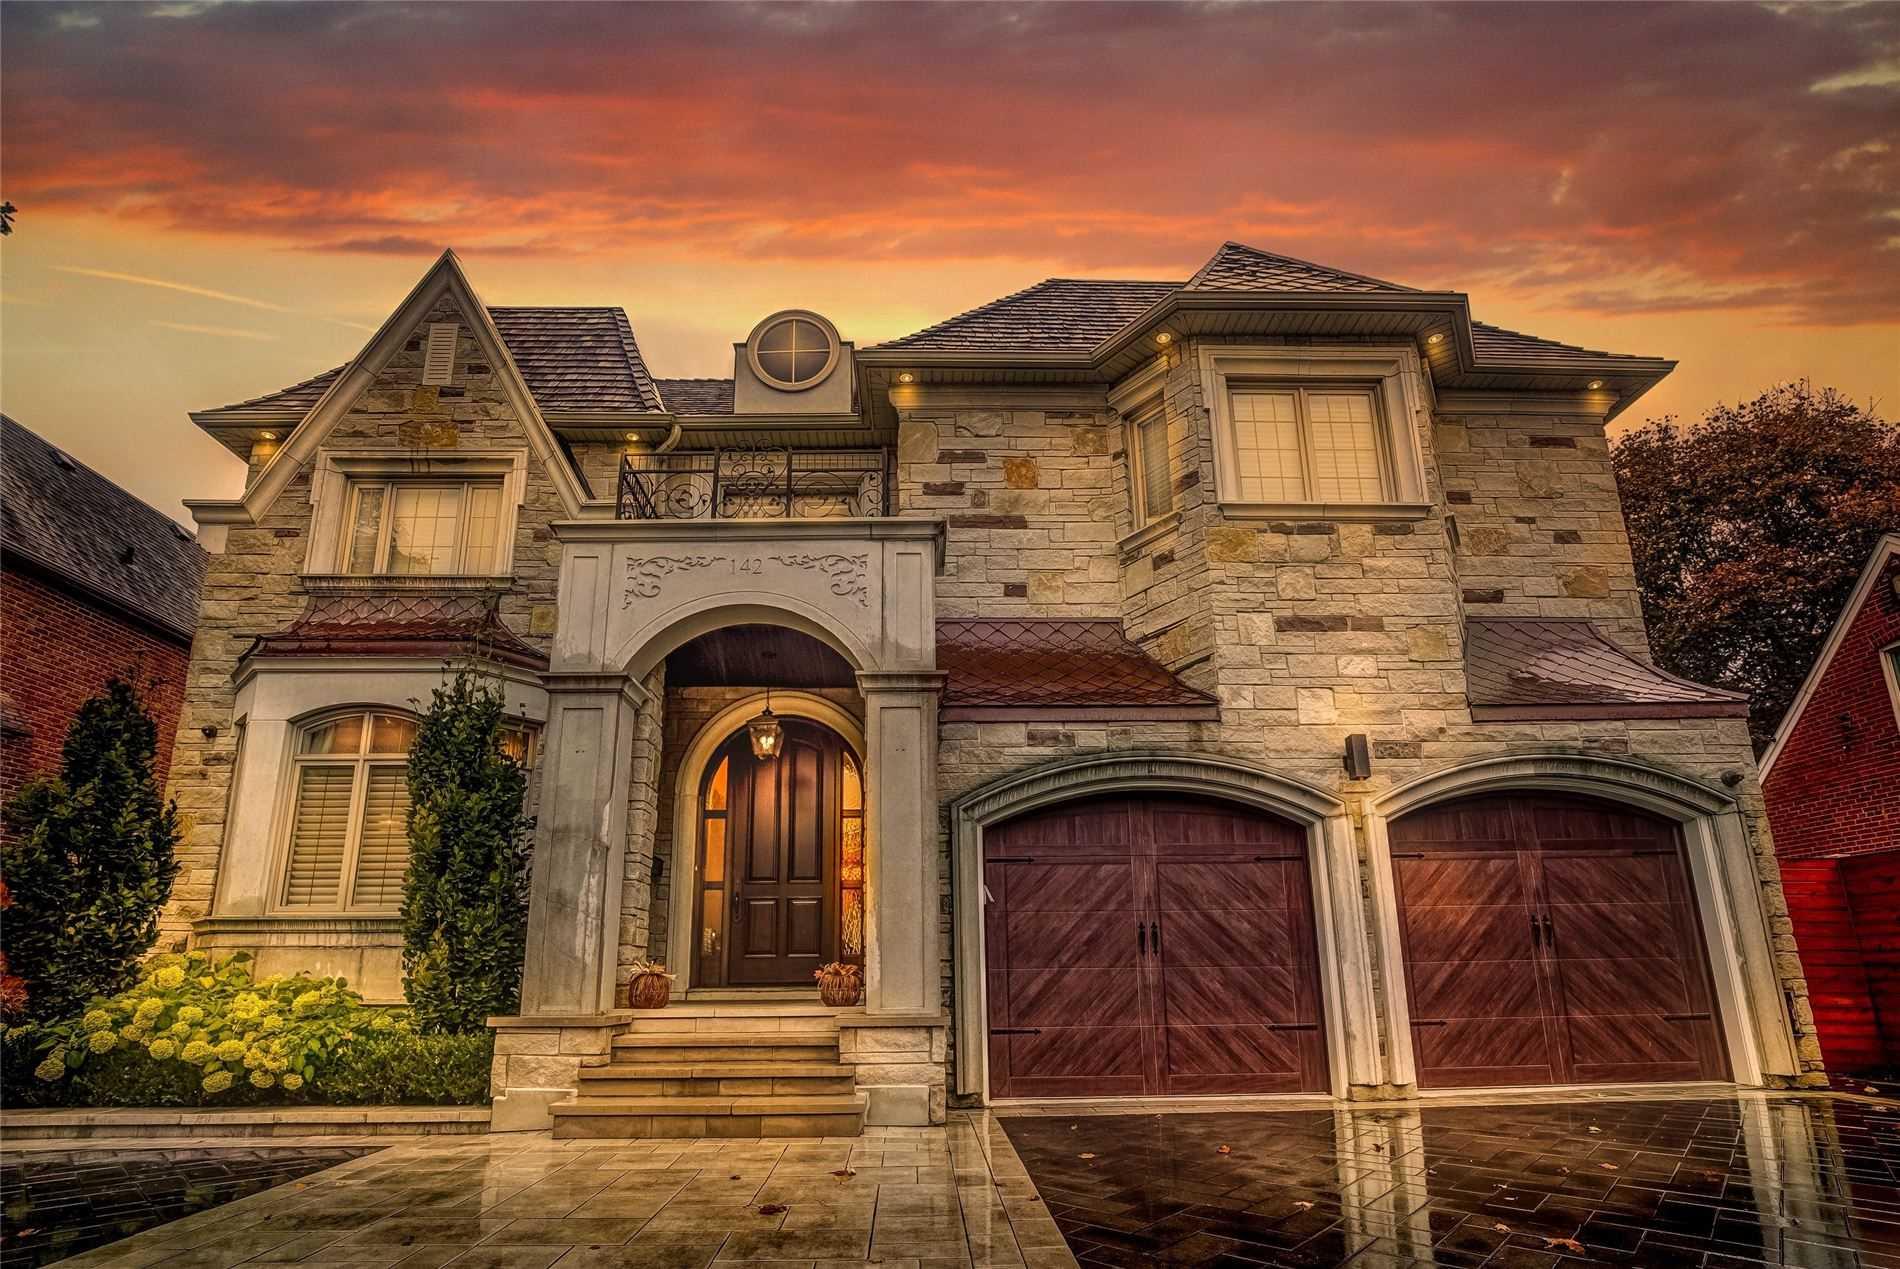 142 Upper Canada Dr, St. Andrew-Windfields, Toronto, Ontario M2P1S8, 4 Bedrooms Bedrooms, 11 Rooms Rooms,5 BathroomsBathrooms,Detached,For Sale,Upper Canada,C4958874